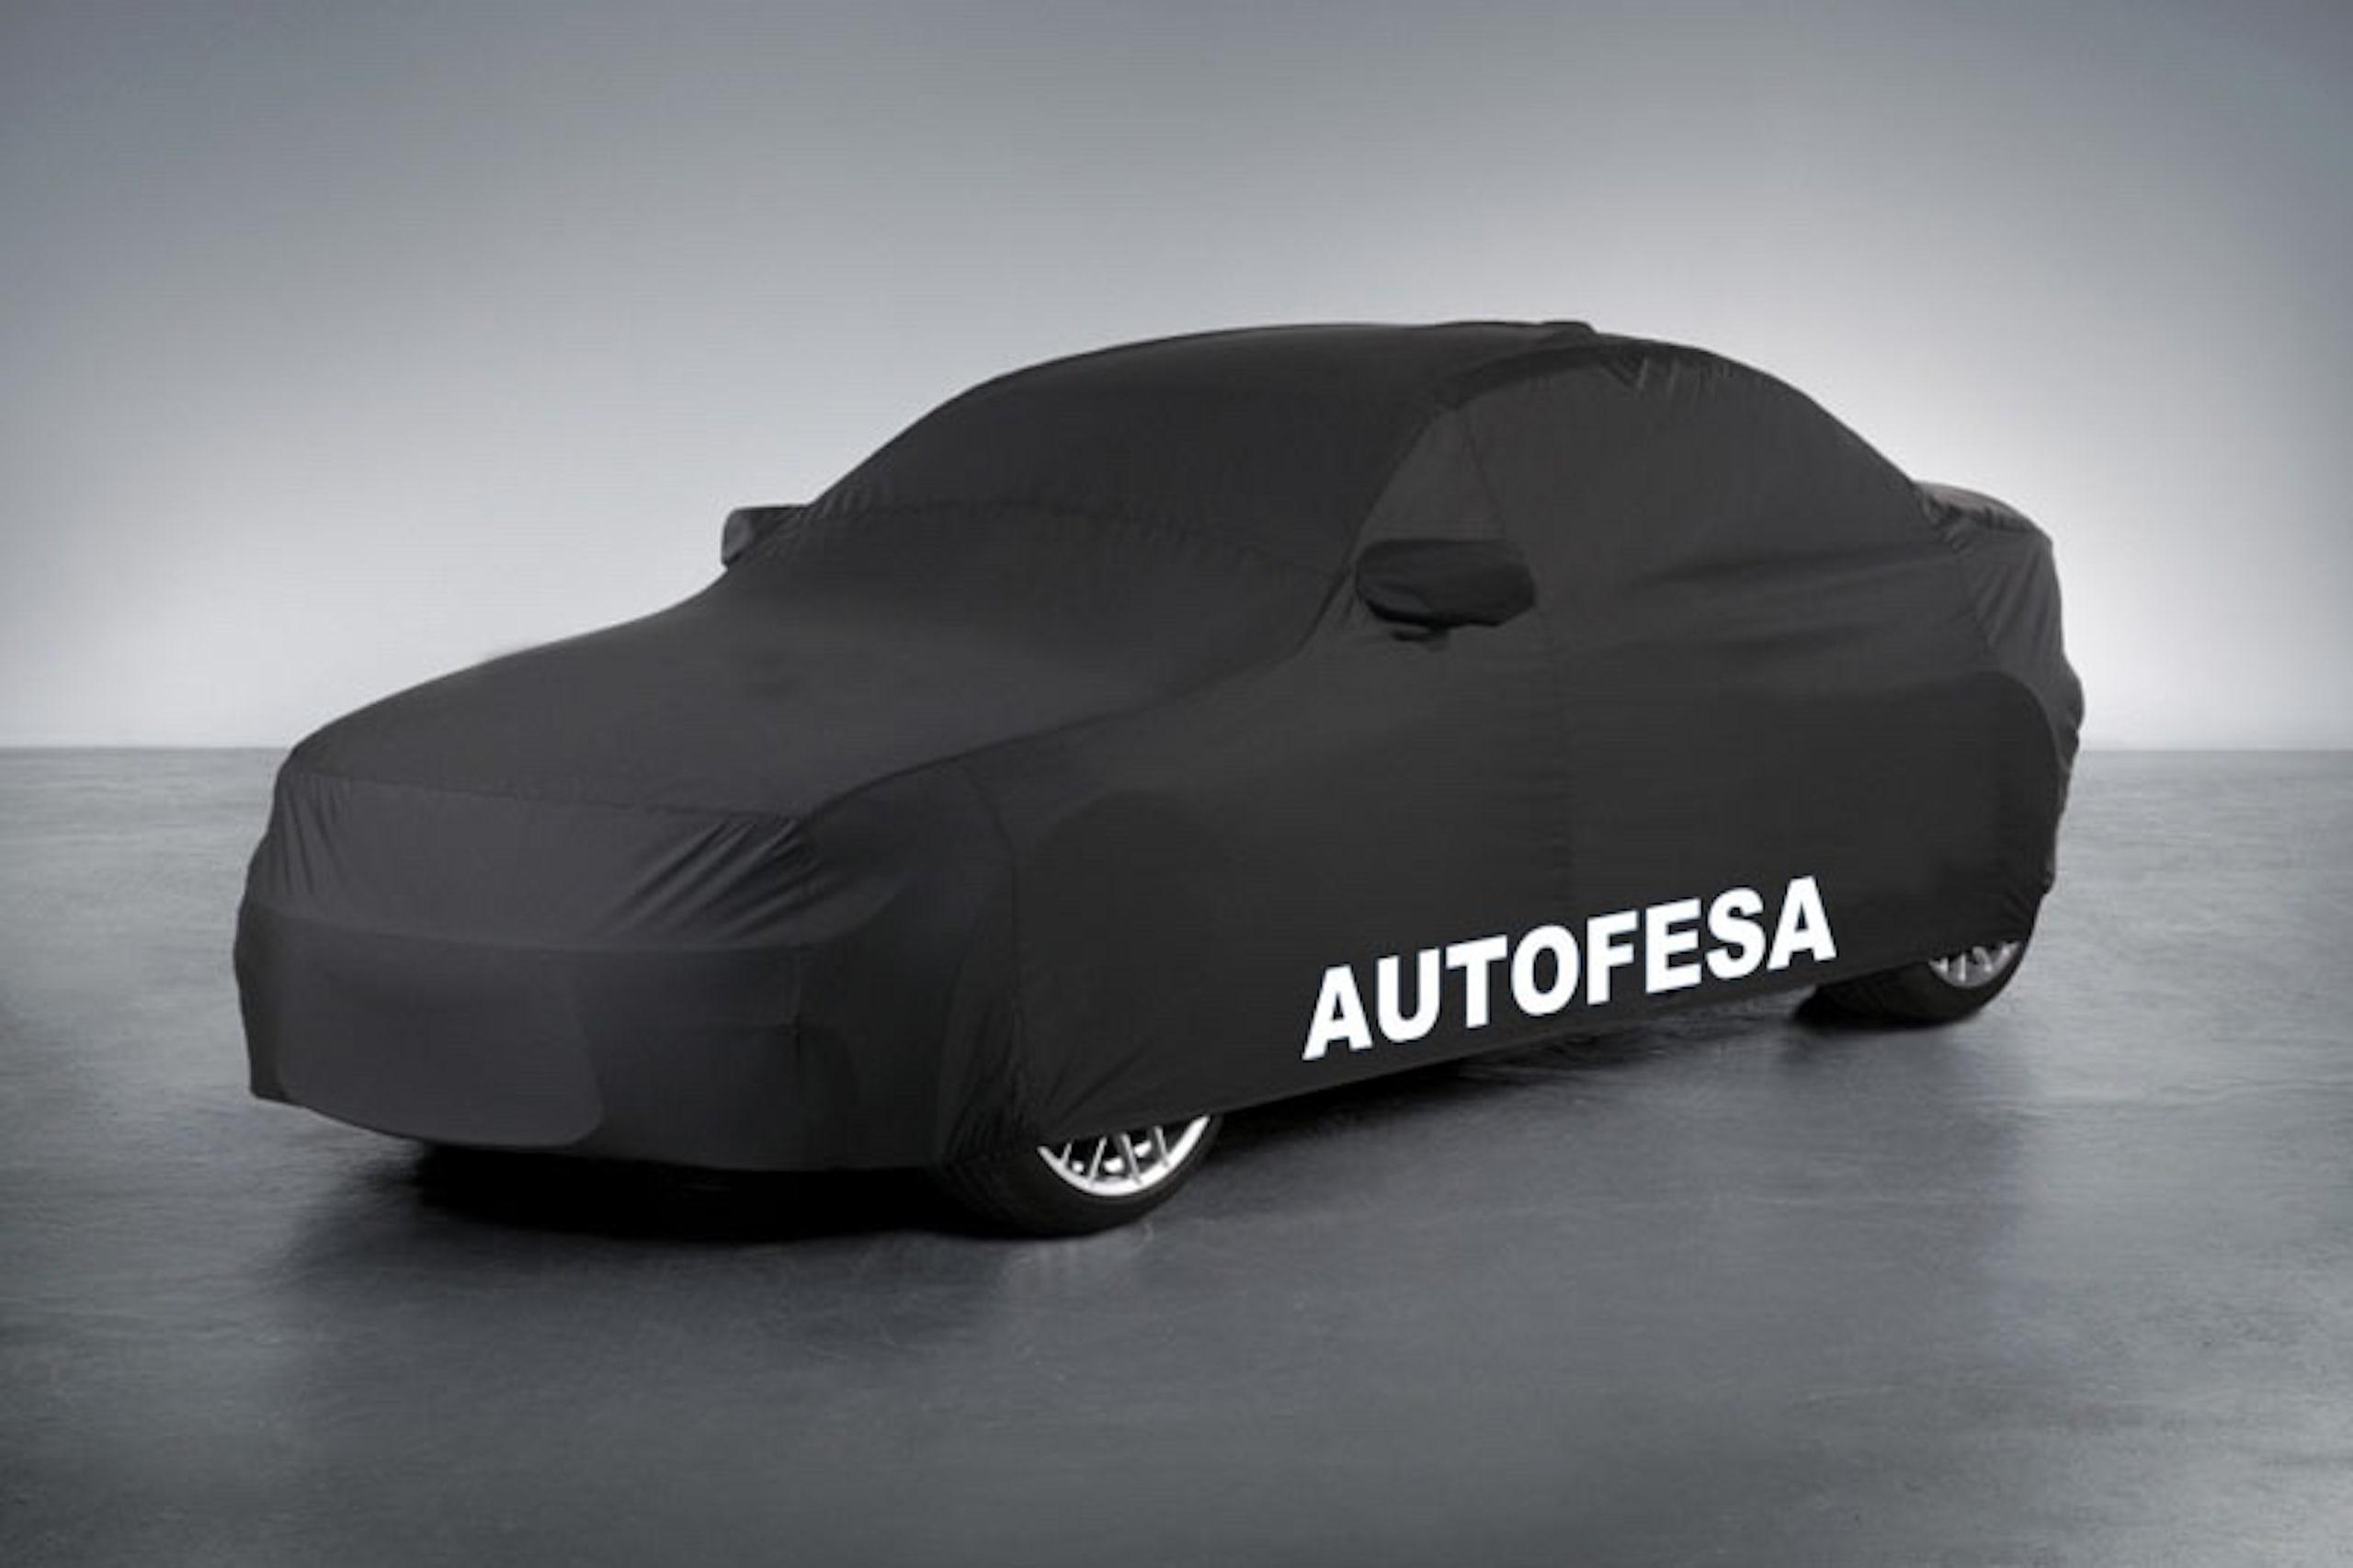 Mitsubishi Outlander 2.0 DI-D 150cv Motion 2WD 5p 7plz Auto S/S - Foto 14